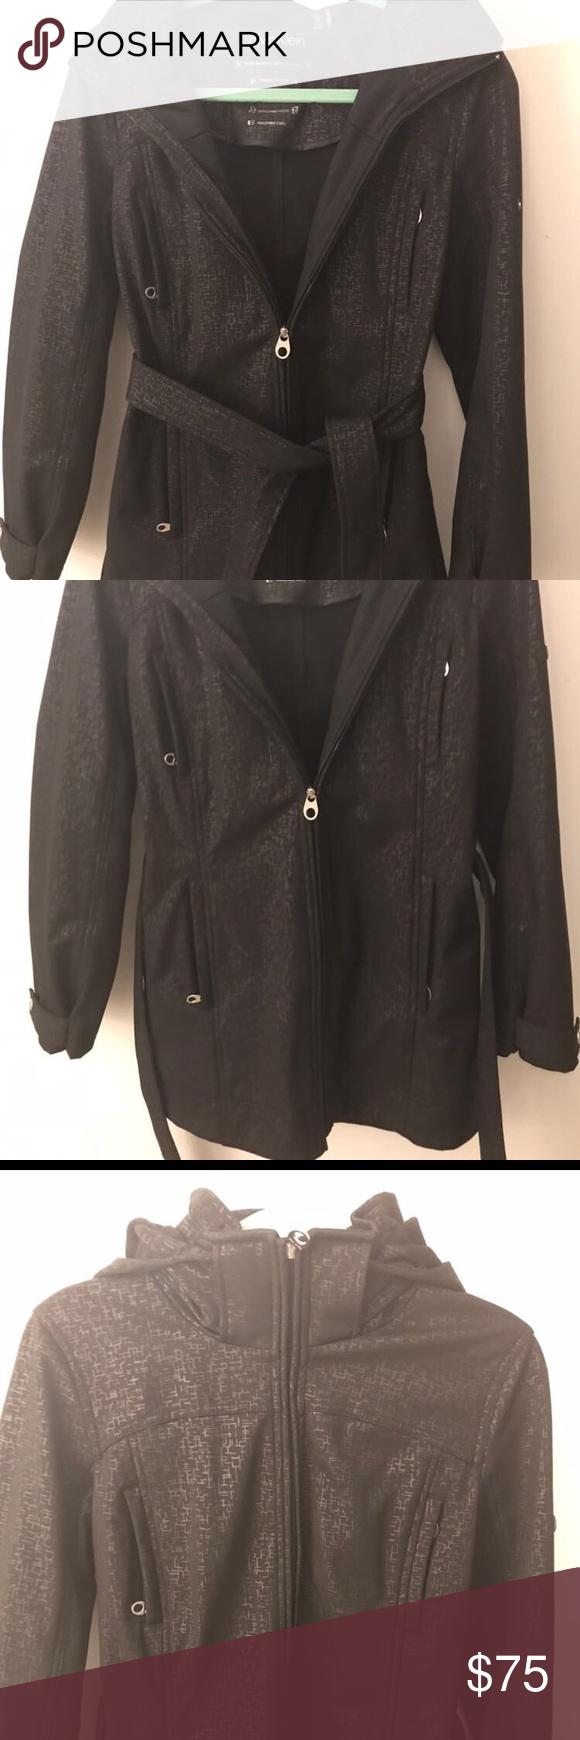 LAST PRICE🌟Calvin Klein all purpose jacket 🛍 Clothes